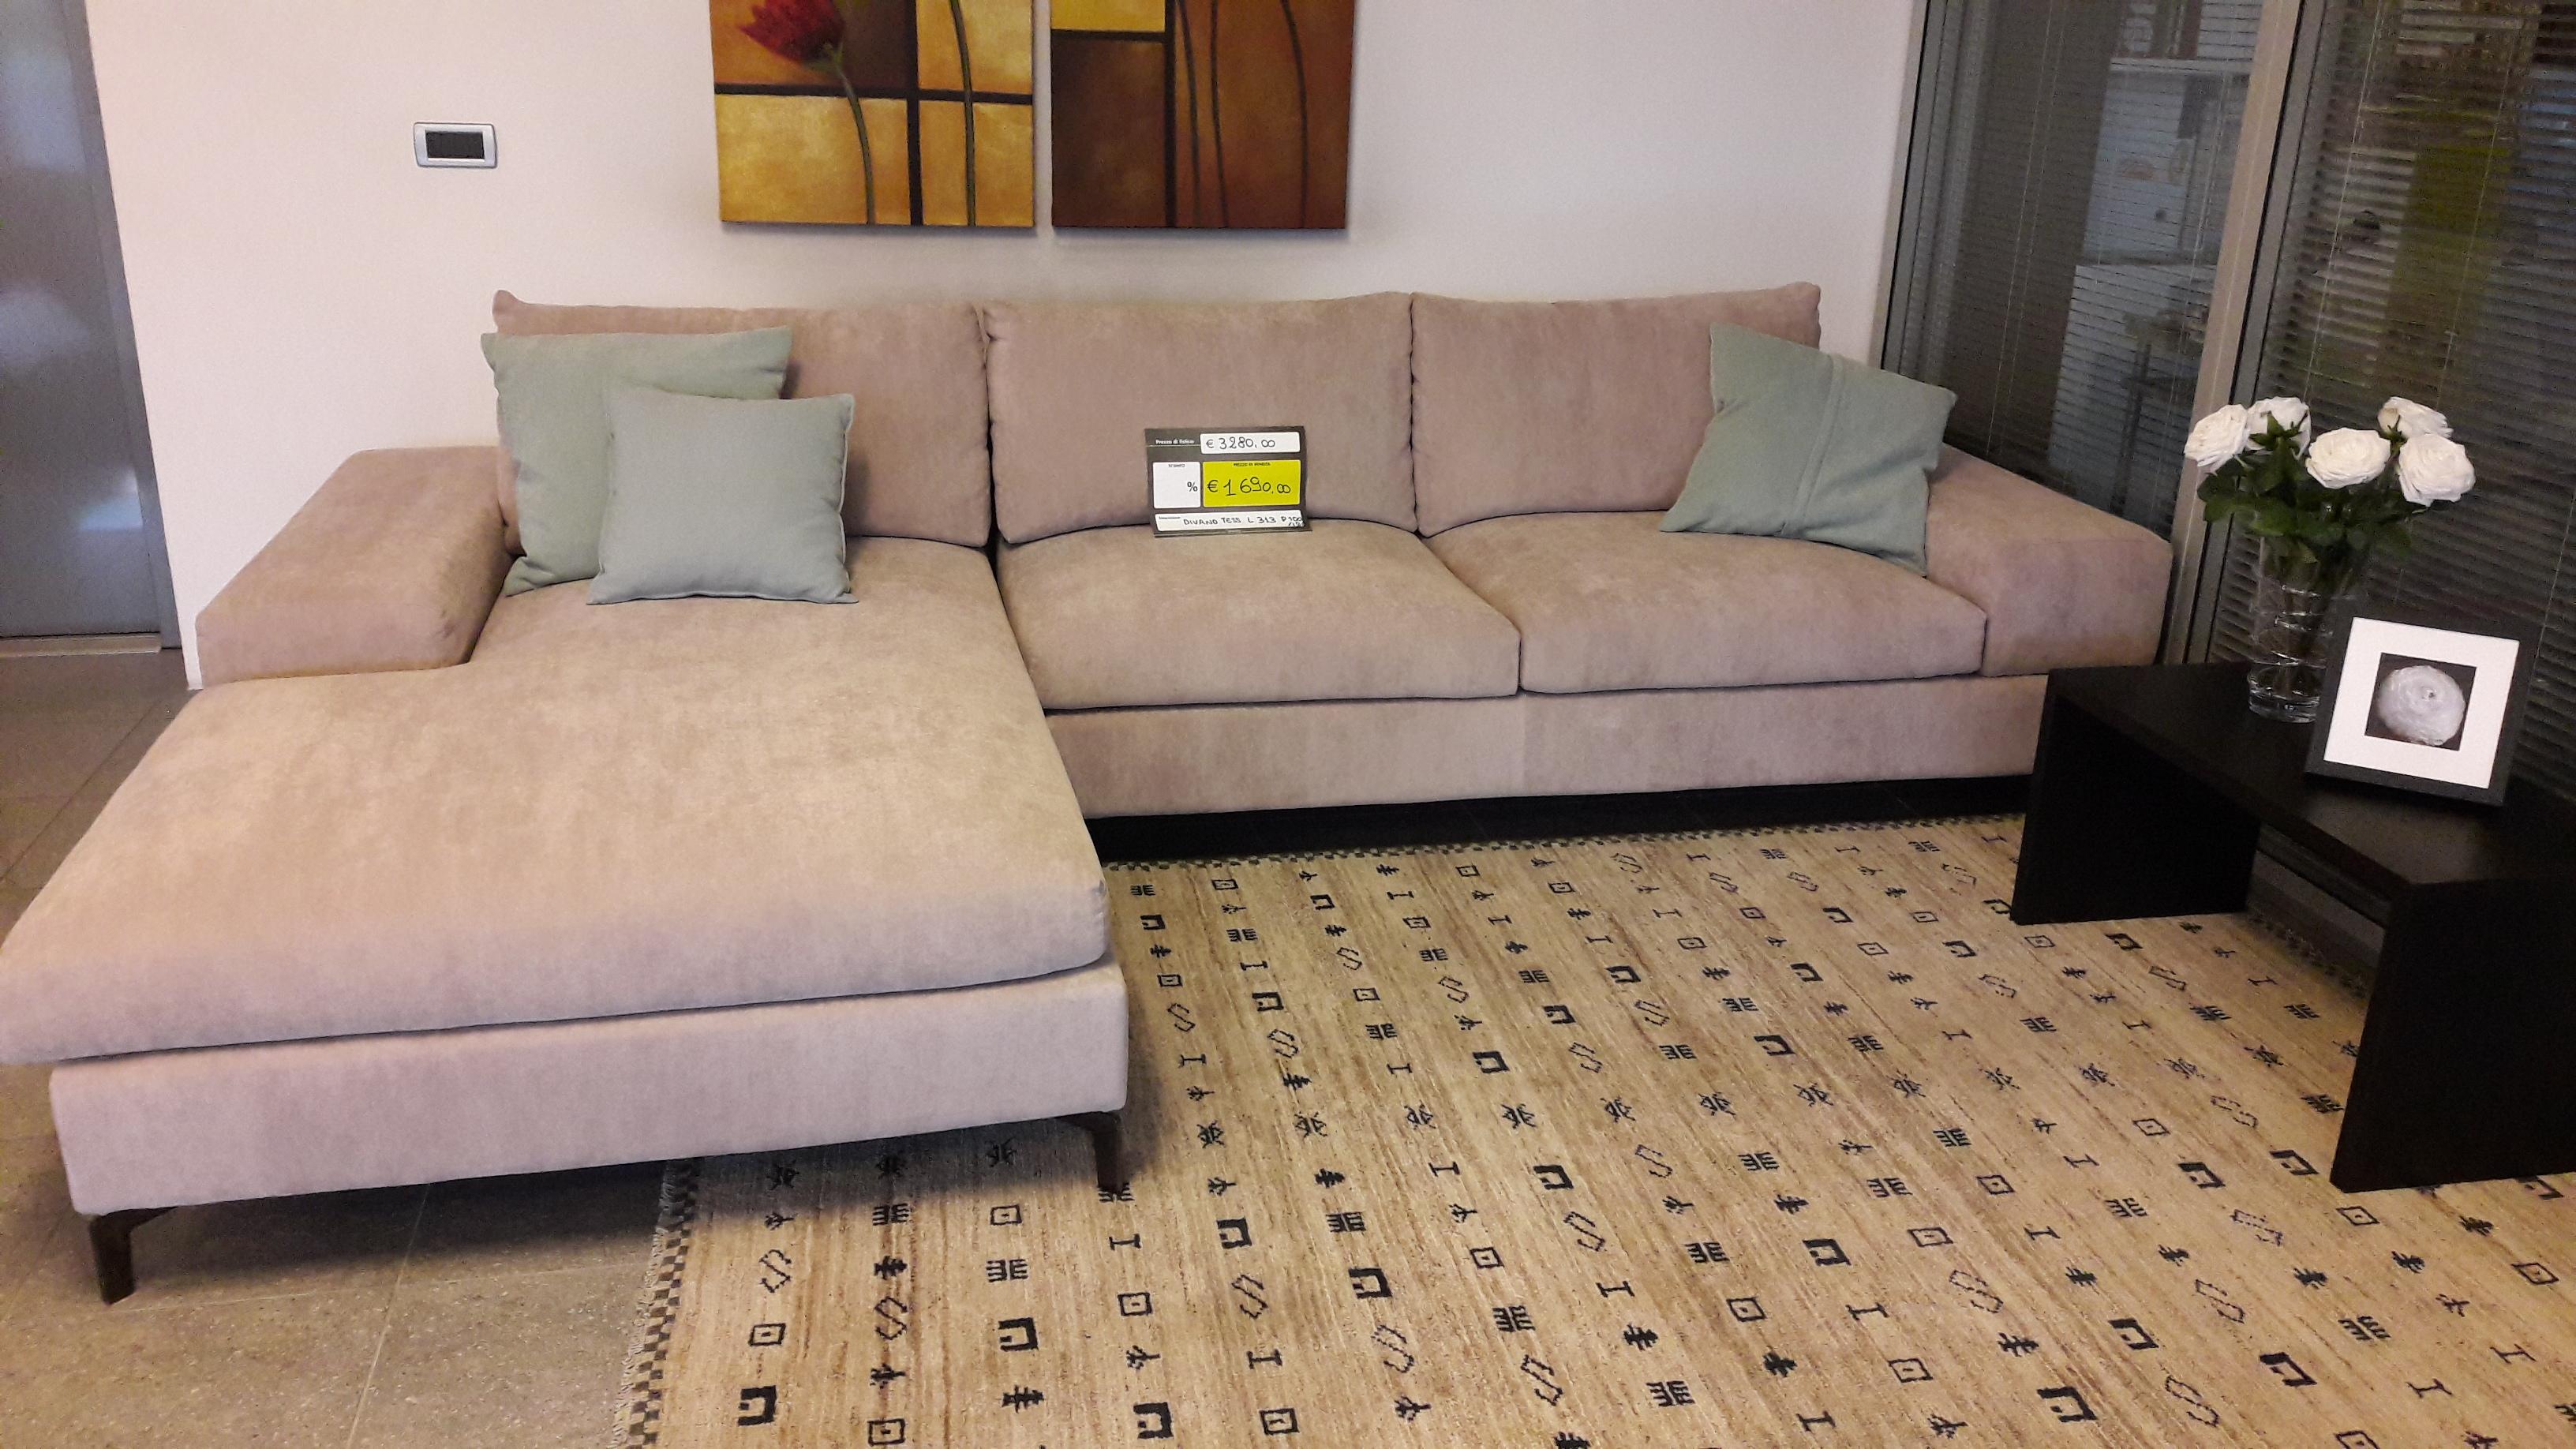 Divano con penisola modello otis rivestimento tessuto effetto vellutato tinta papiro casa ingross - Tessuto rivestimento divano ...